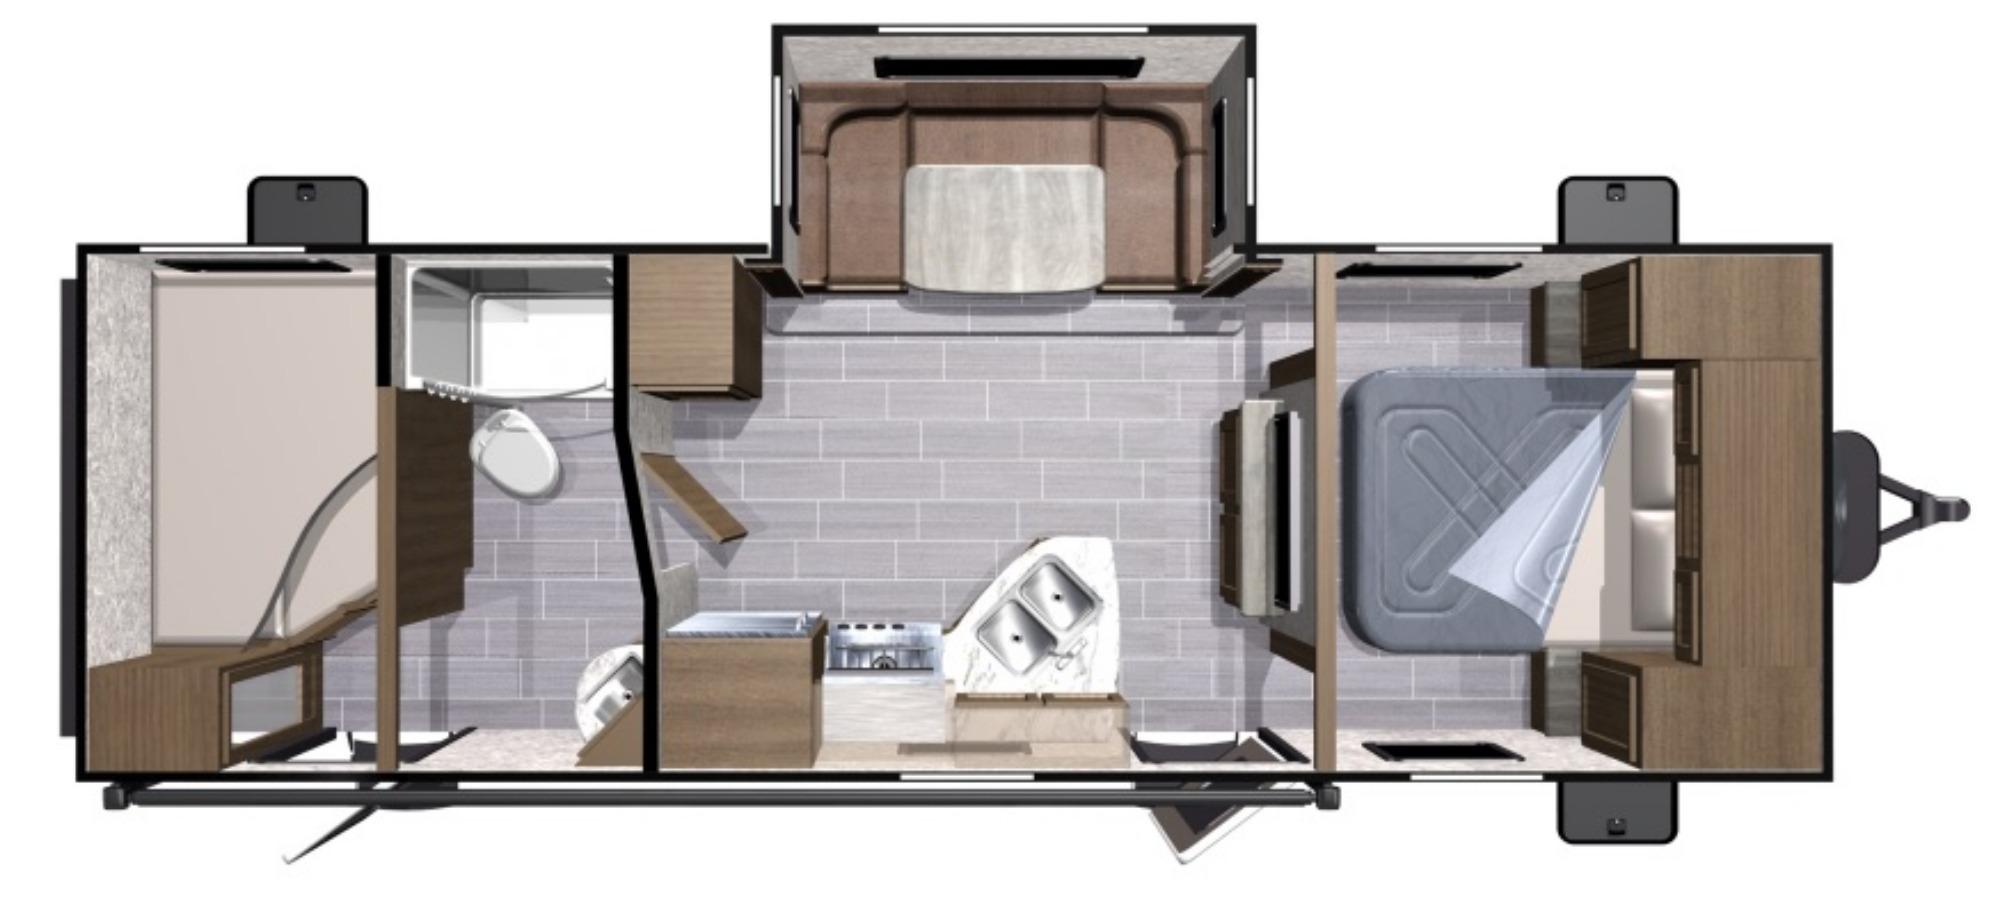 View Floor Plan for 2018 HIGHLAND RIDGE OPEN RANGE ULTRA LITE 2510BH